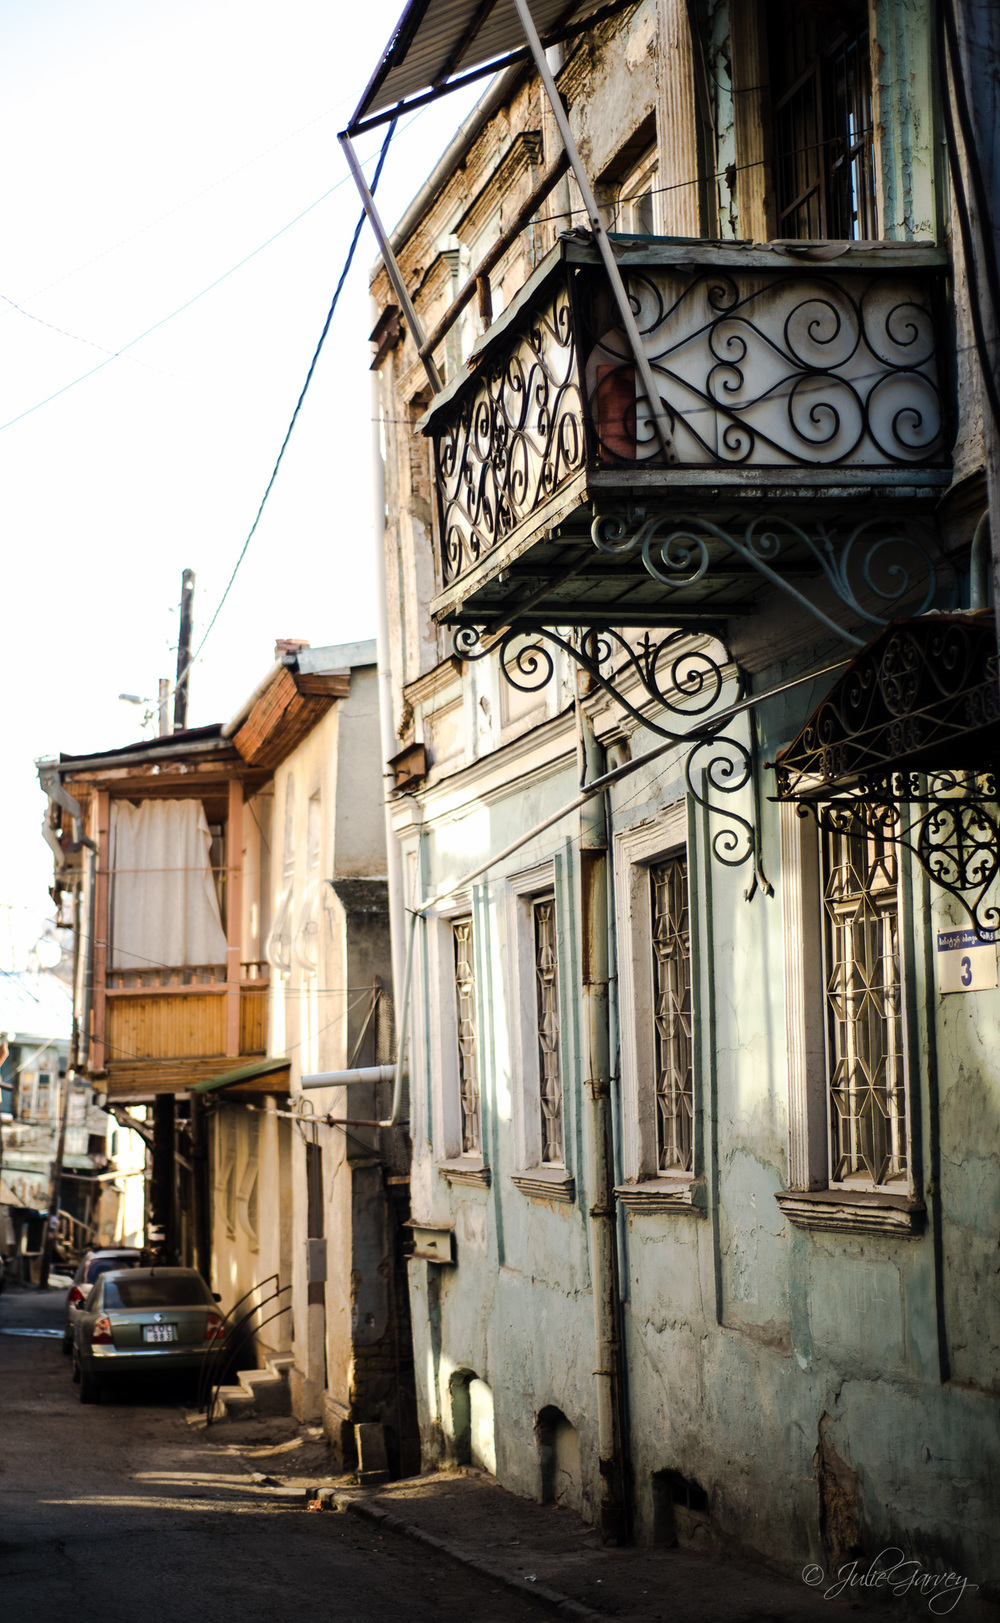 URBAN-Tbilisi-Online-1292.jpg